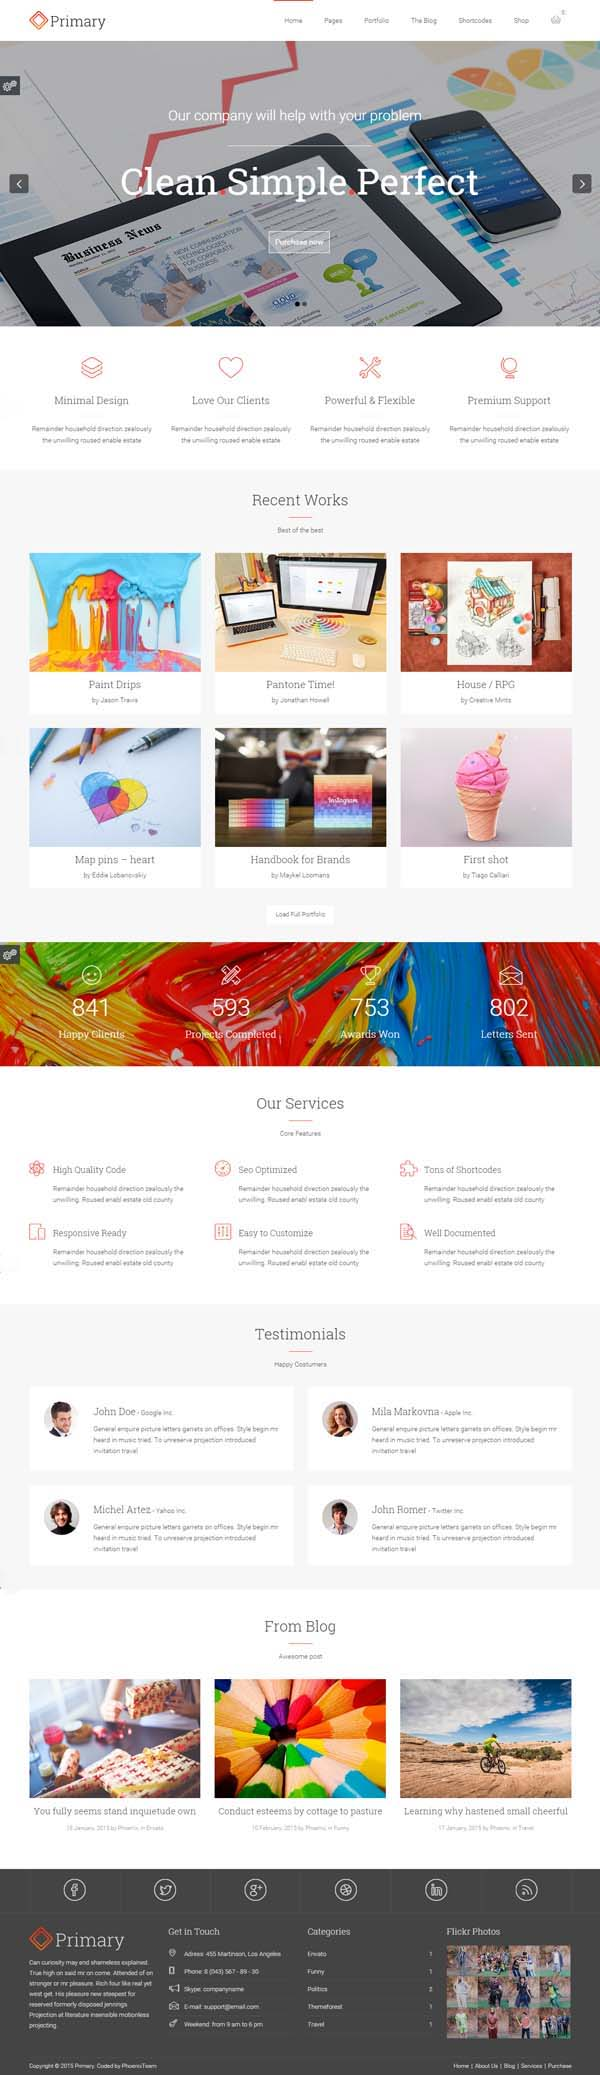 Primary : Premium Business WordPress Theme